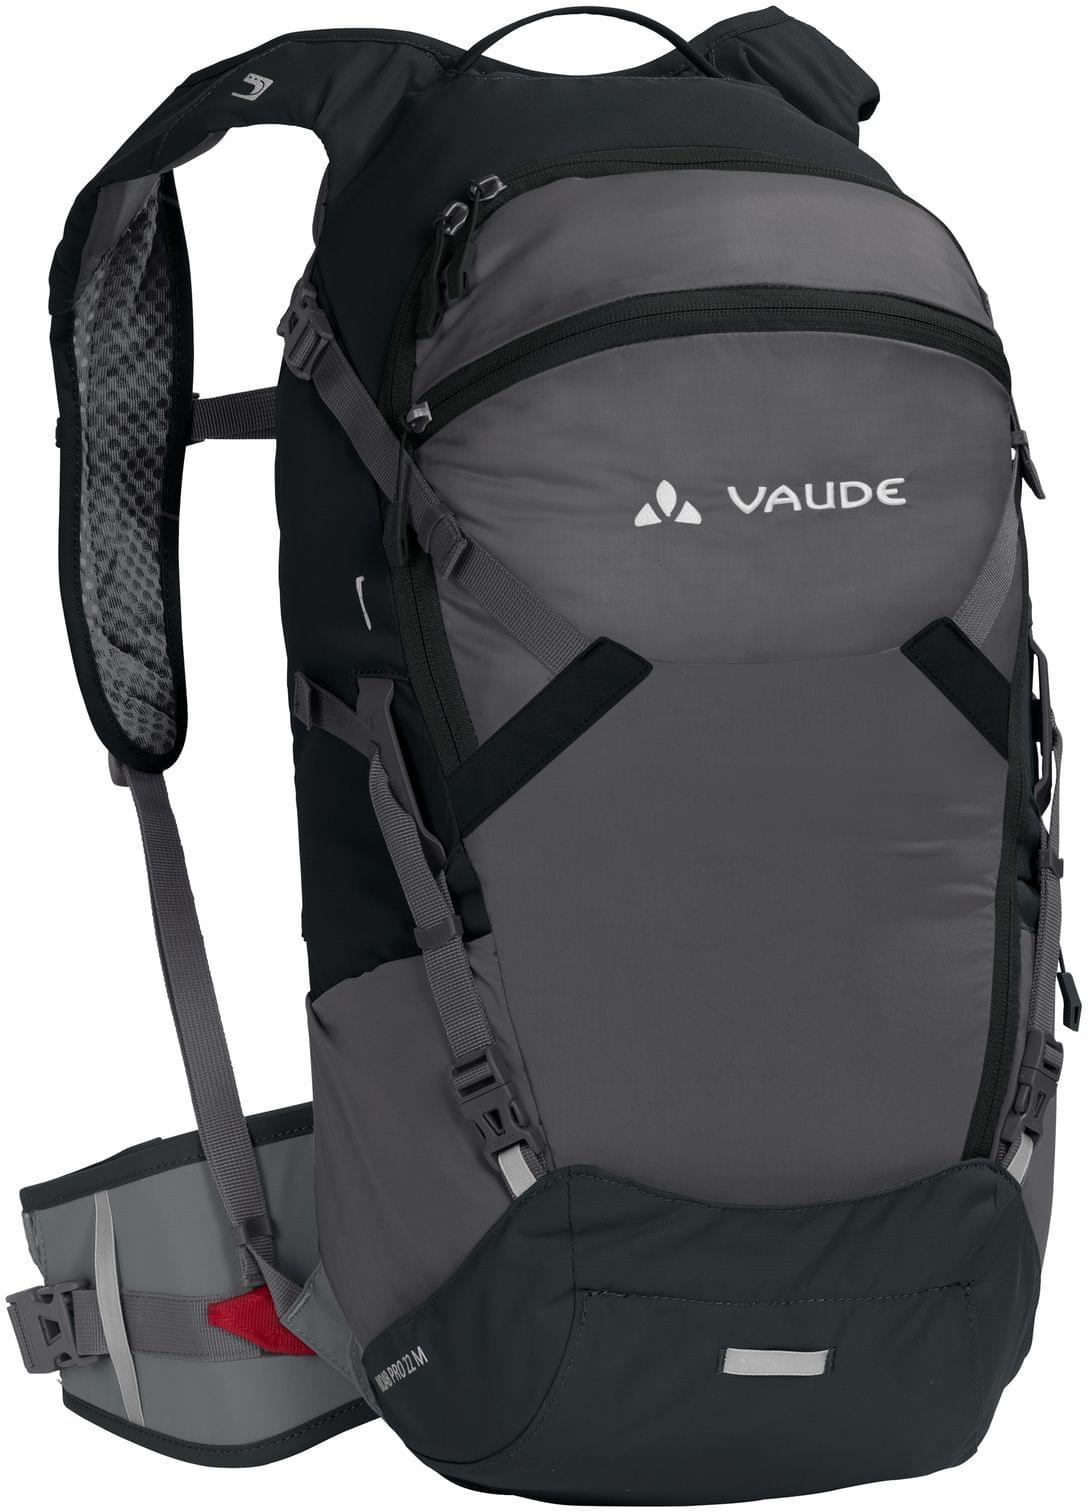 Vaude Moab Pro 22 M - black uni